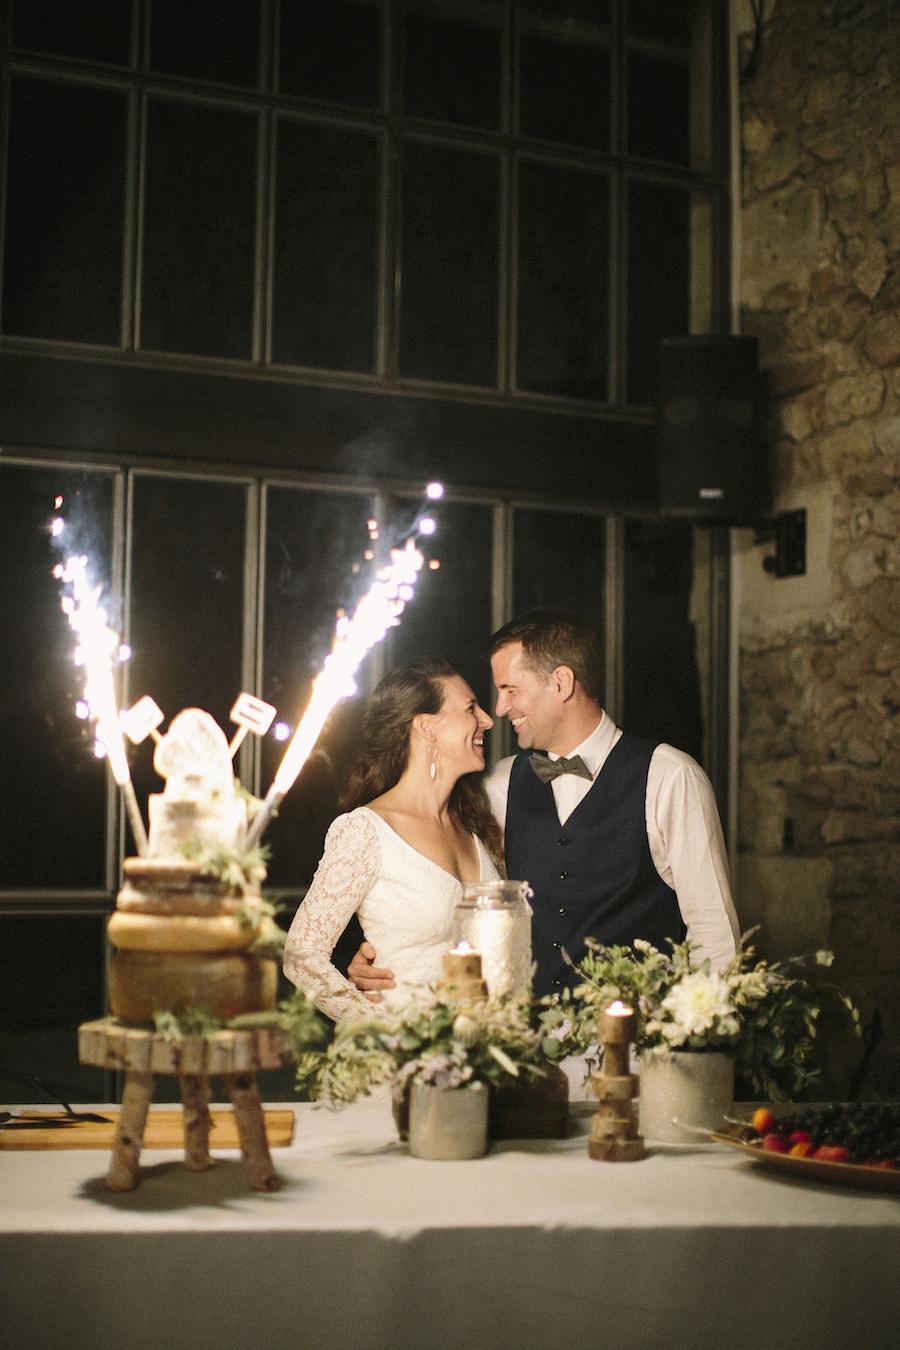 saya-photography-rustic-french-wedding-provence-domaines-de-patras-111.jpg